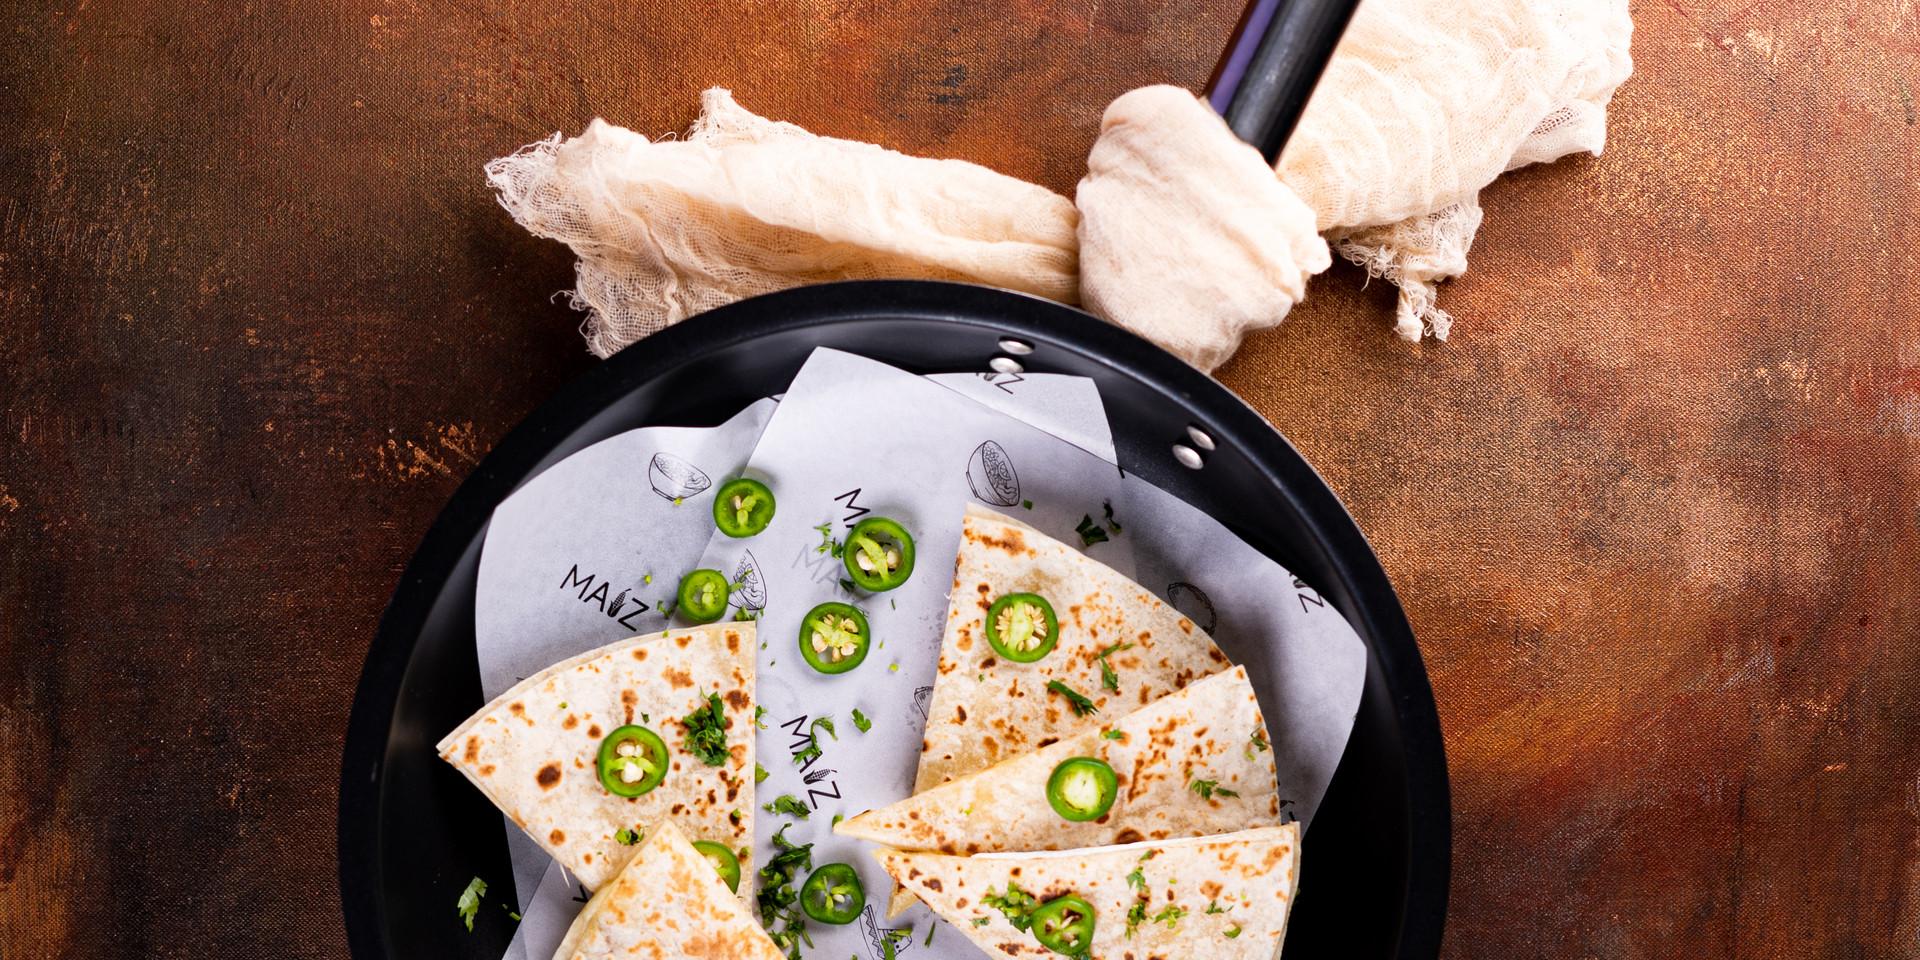 quesadilla by maiz kitchen